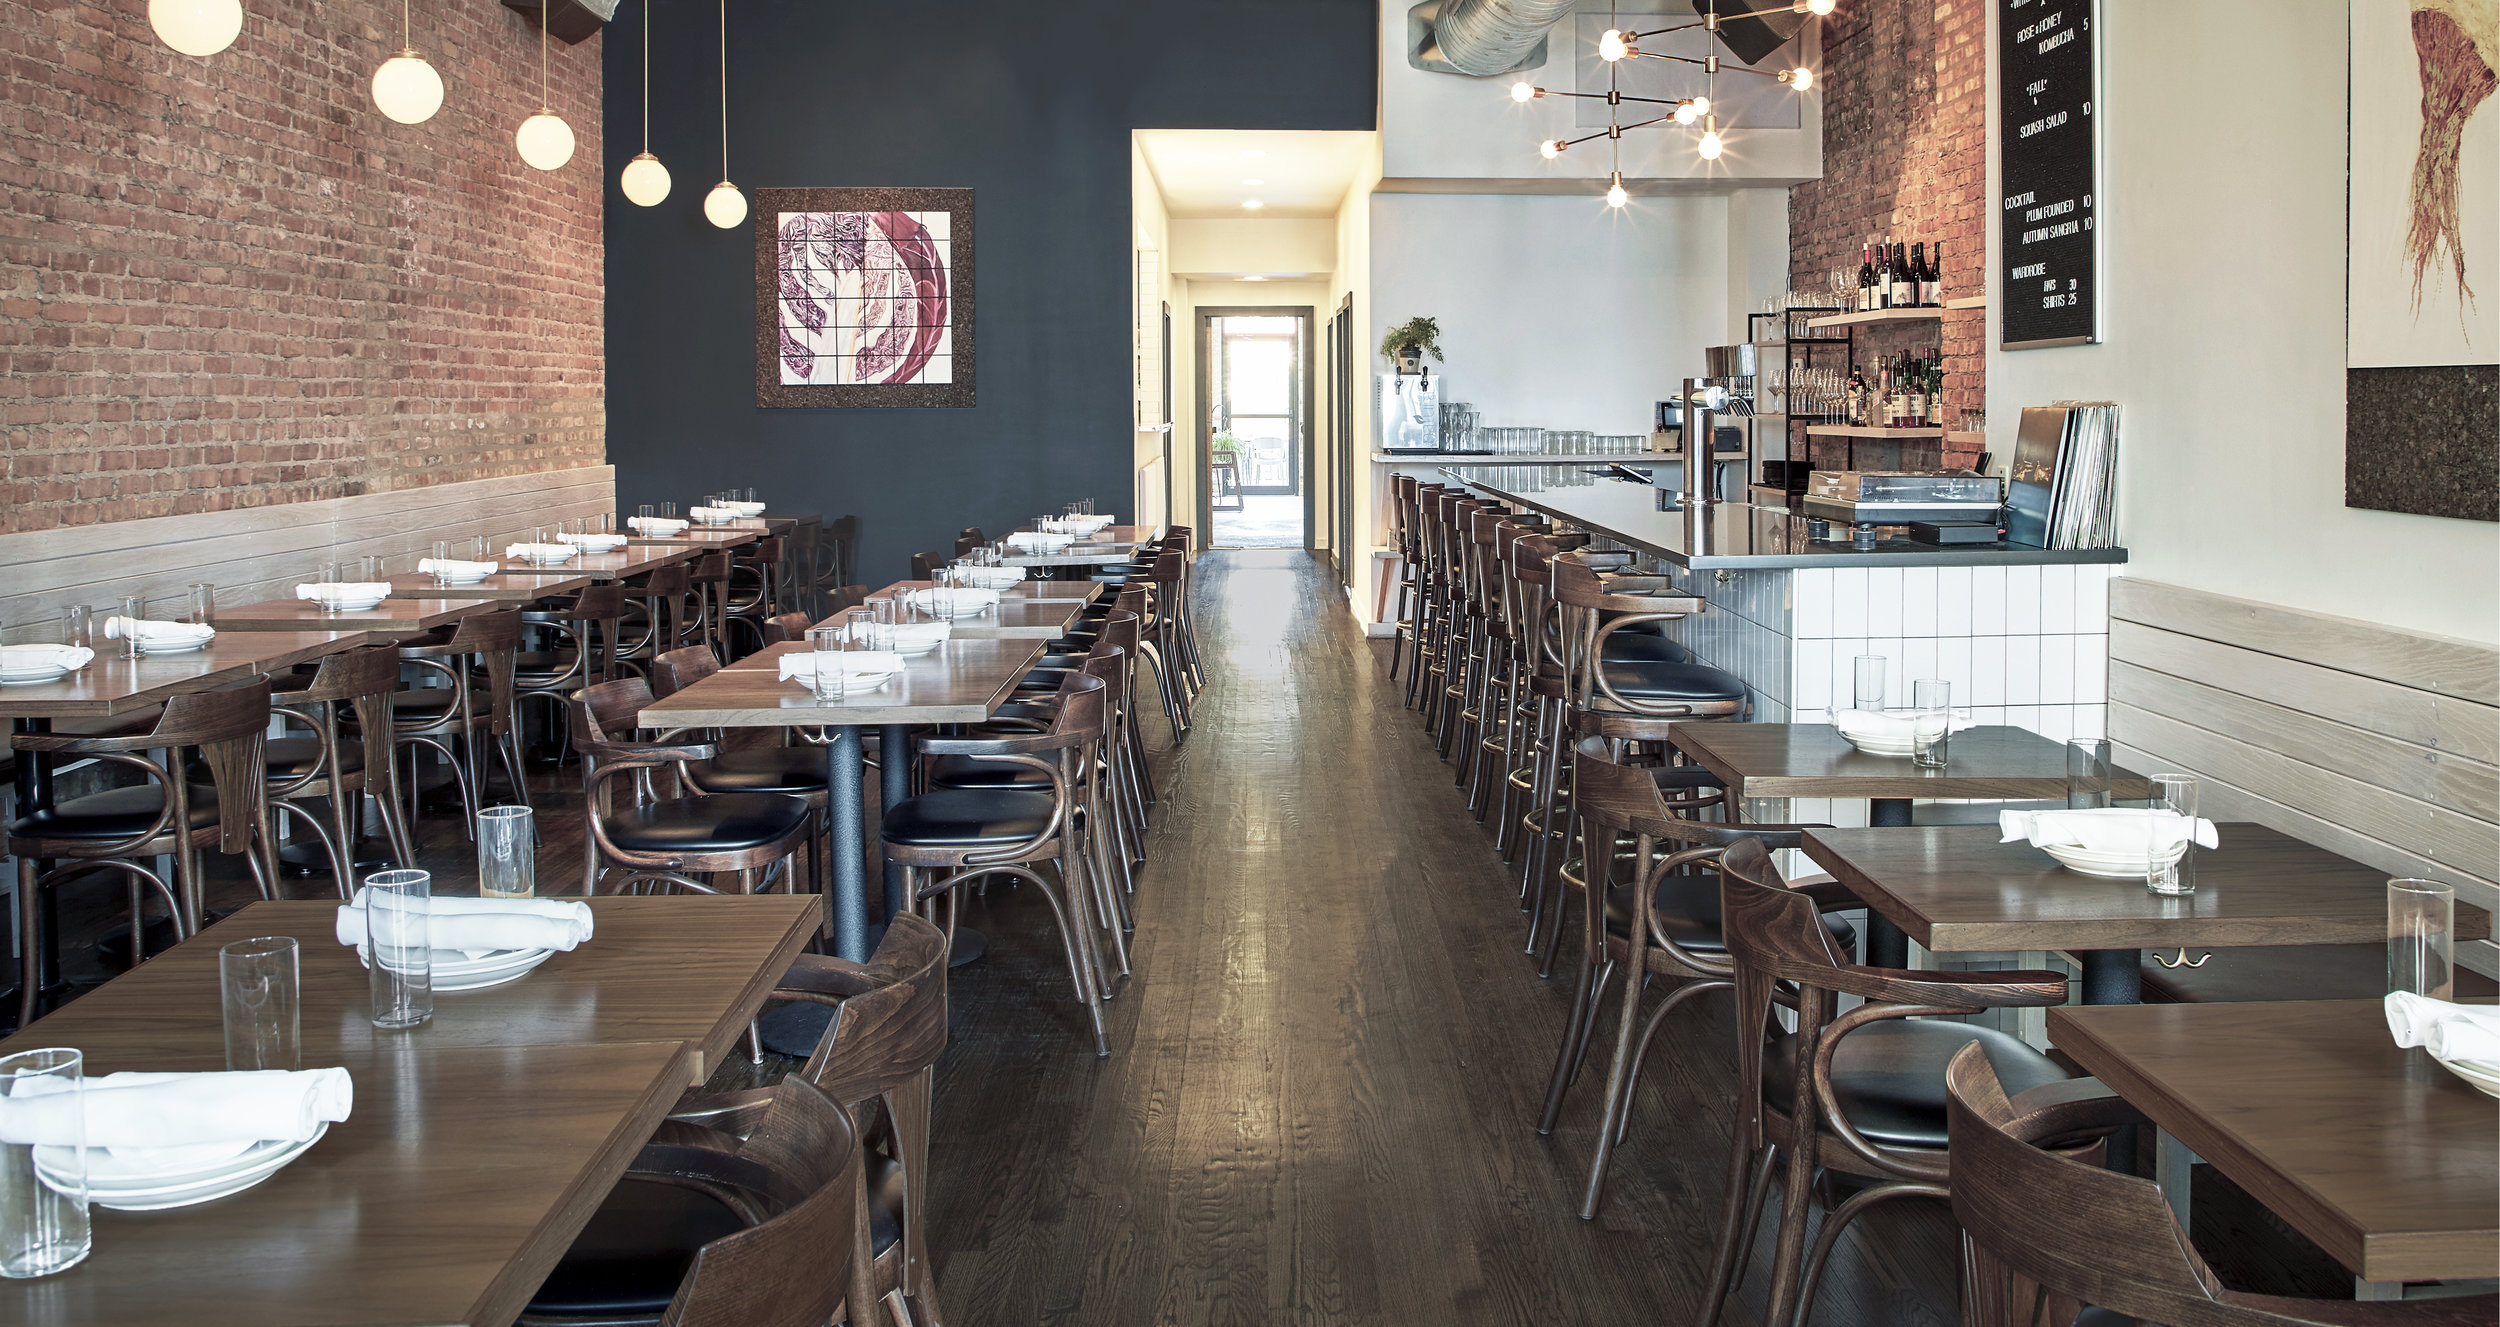 debaun studio_Daisies Restaurant_Dining Room.JPG